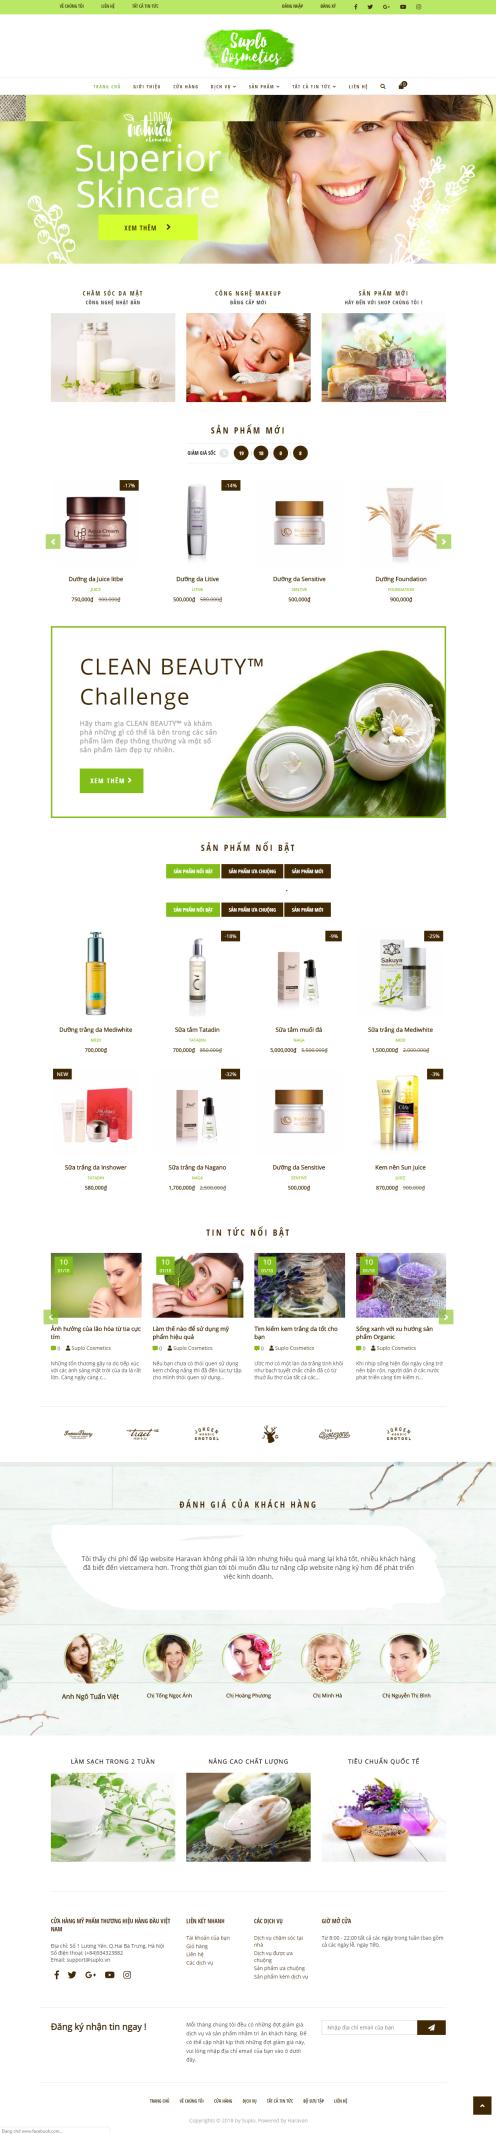 Thiết kế Mẫu website mỹ phẩm MP23